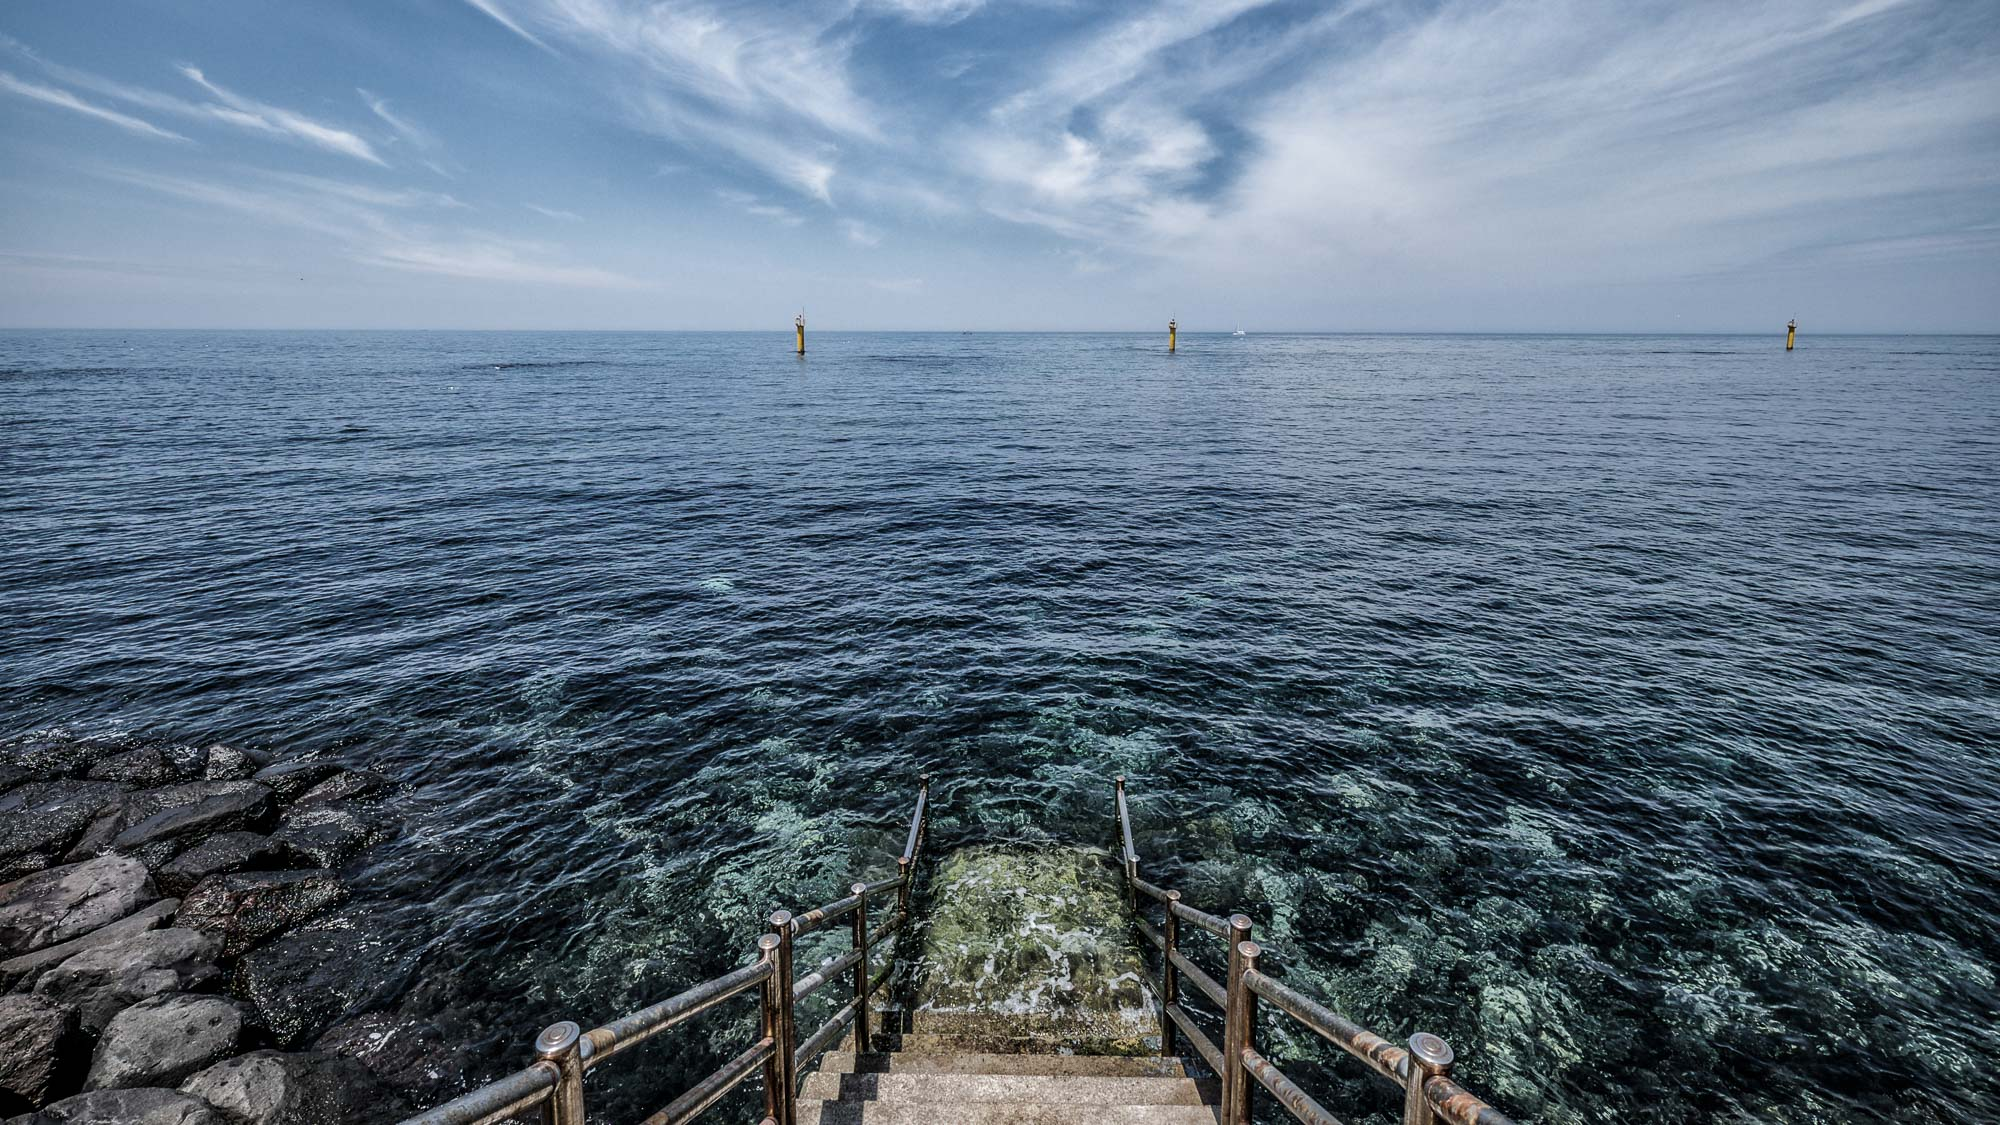 Haenyeo Divers Jeju island photography korea Jose Jeuland EXTRA-17